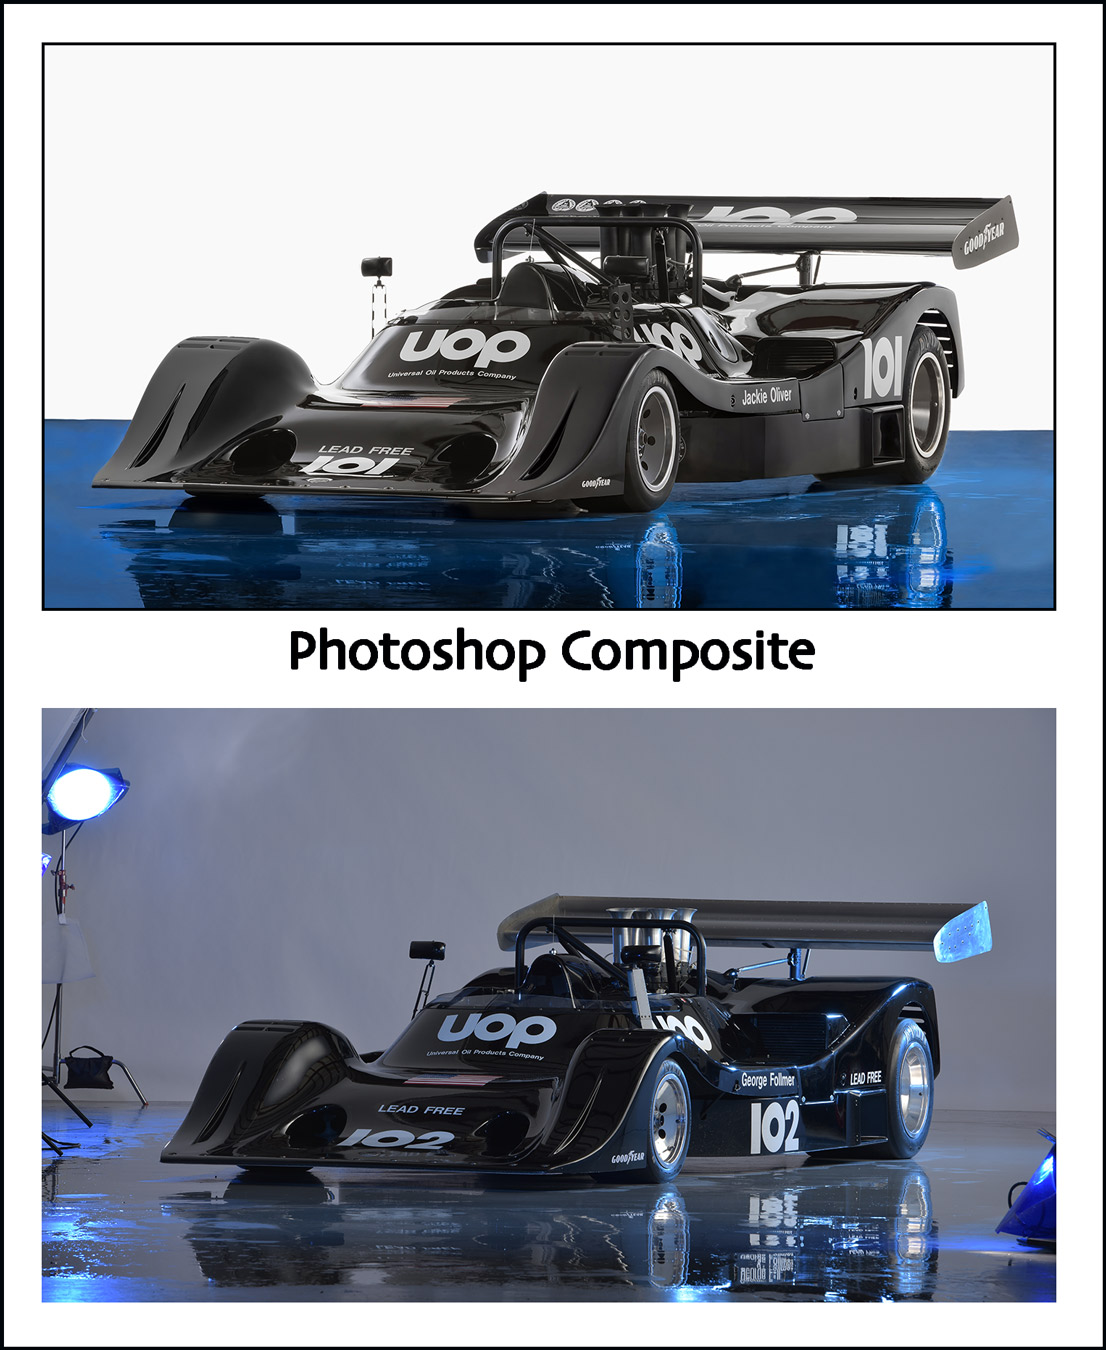 race car in photography studio